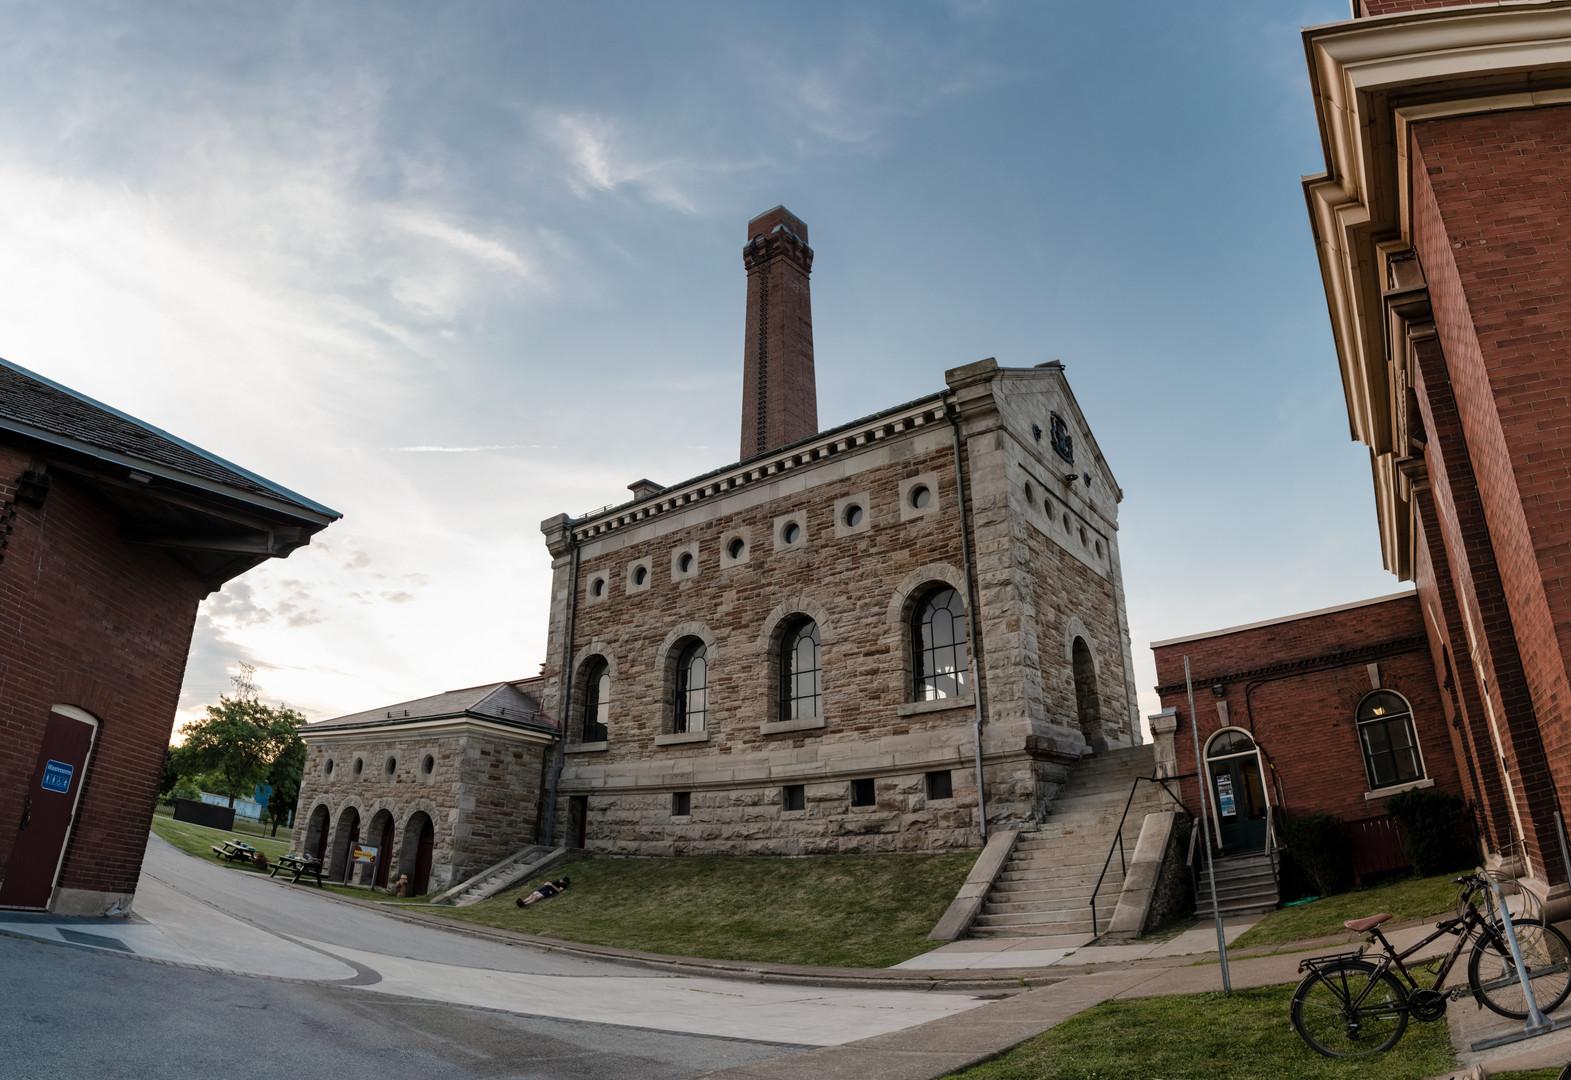 Hamilton's Museum of Steam & Technology